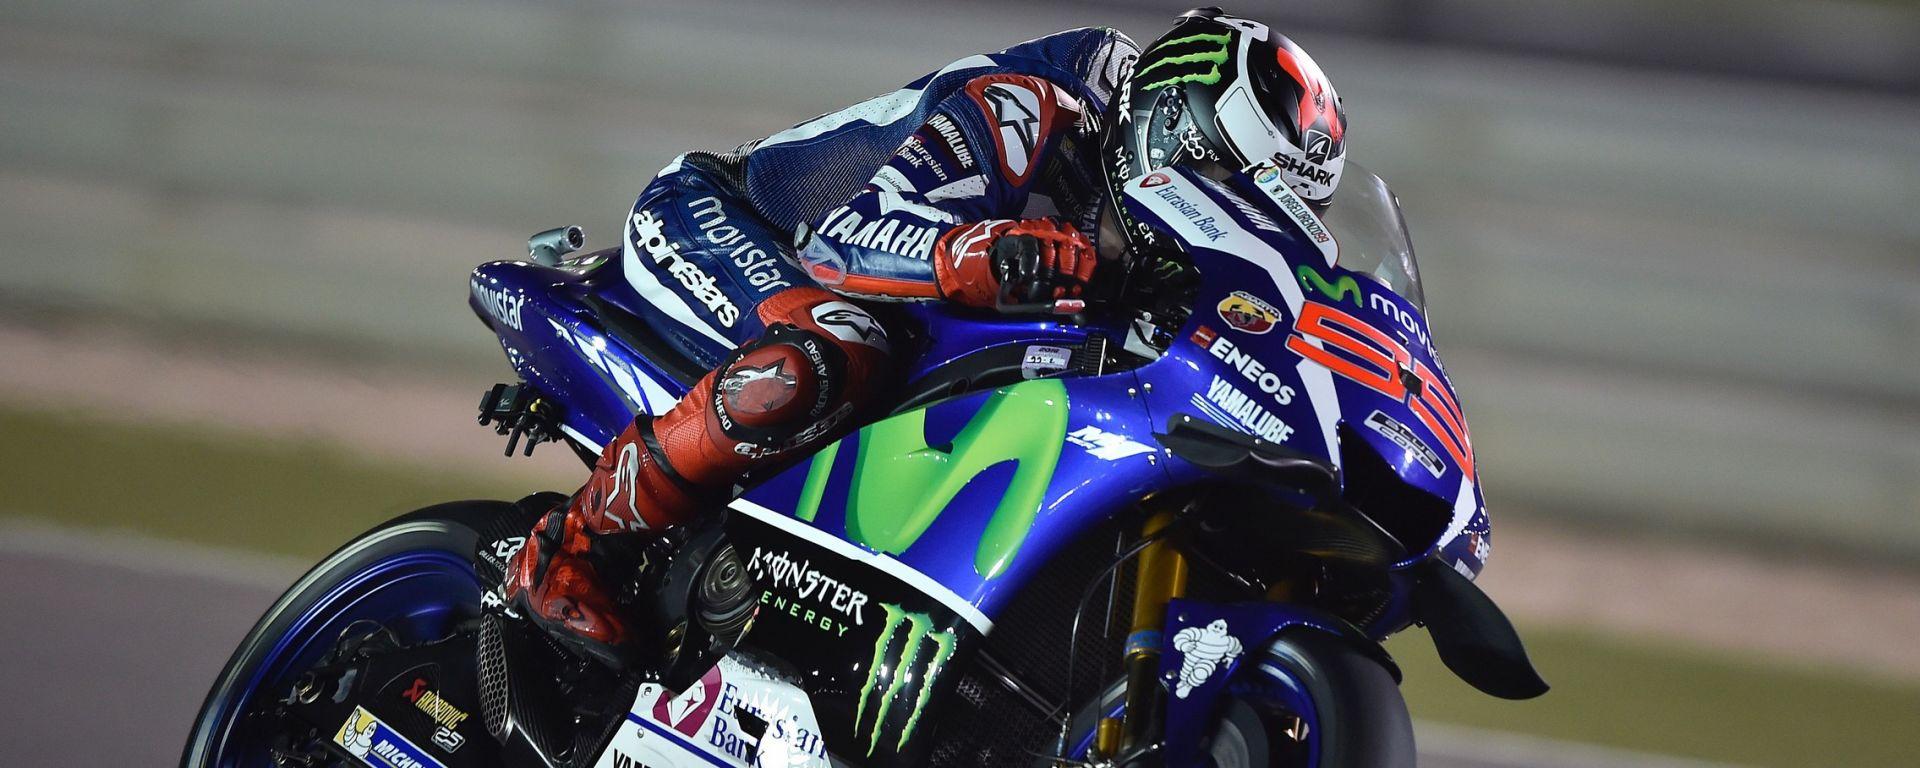 MotoGP 2016: meno tre al Gp del Qatar